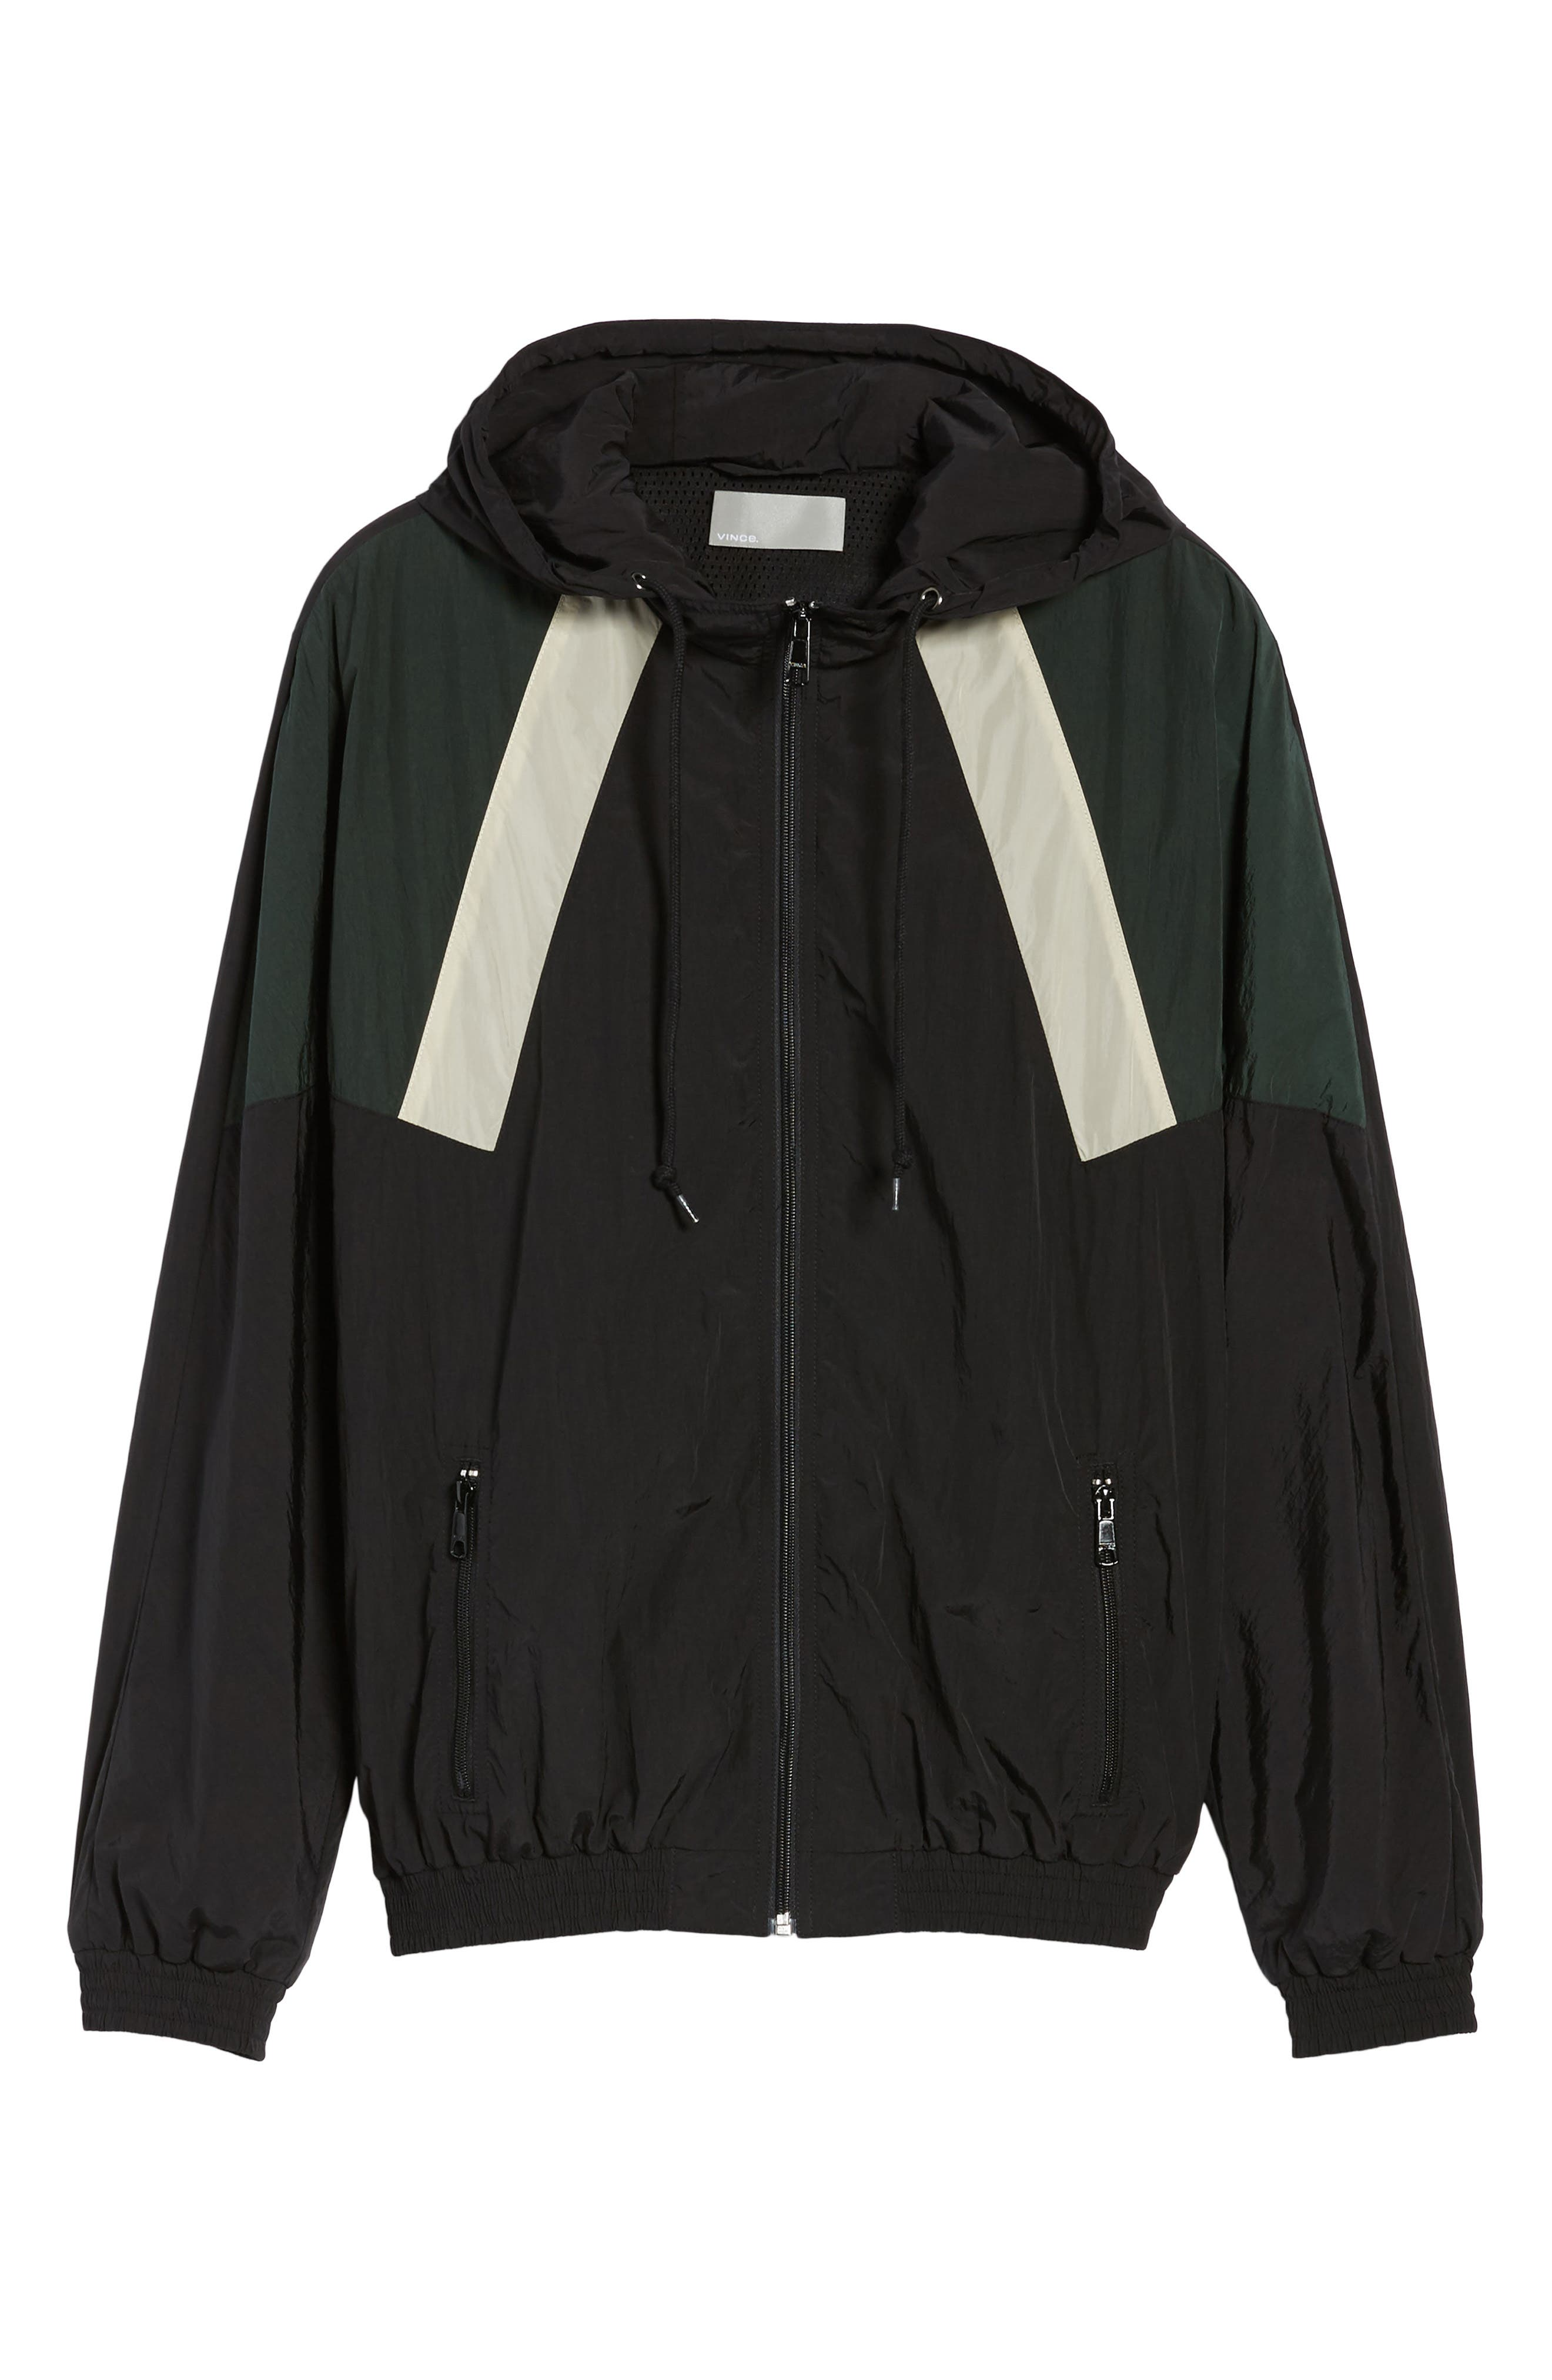 Hooded Shell Jacket,                             Alternate thumbnail 6, color,                             Black/ Deep Forest